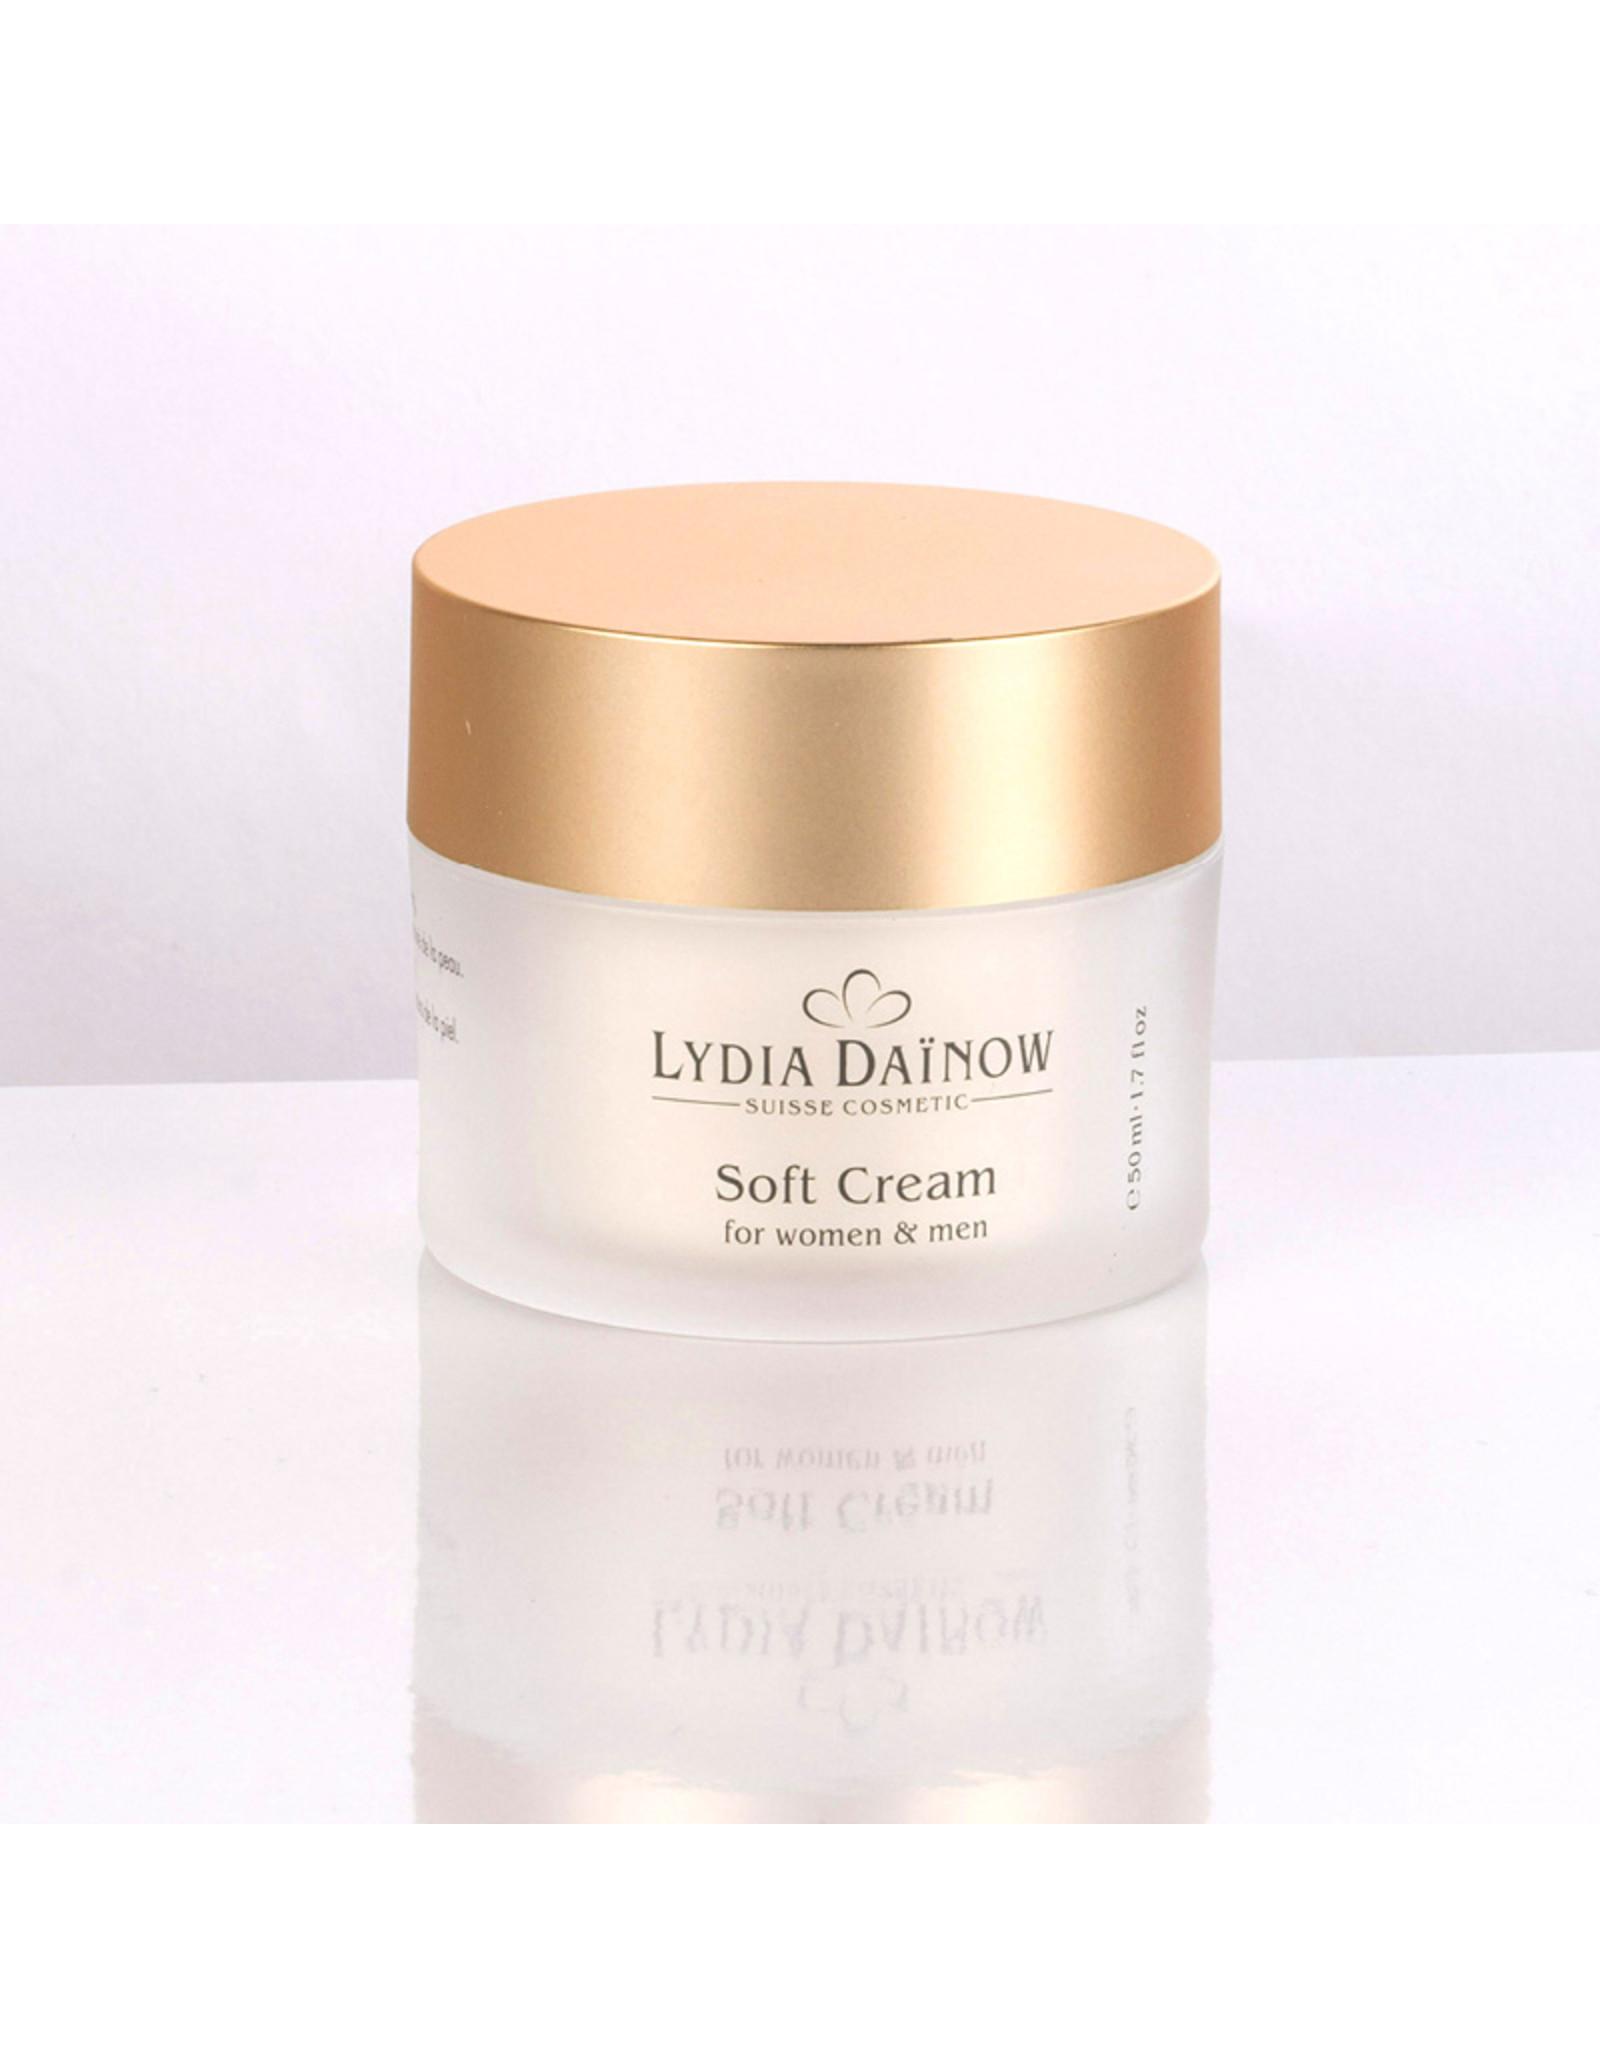 Lydïa Dainow Evolution Soft Cream - Night cream